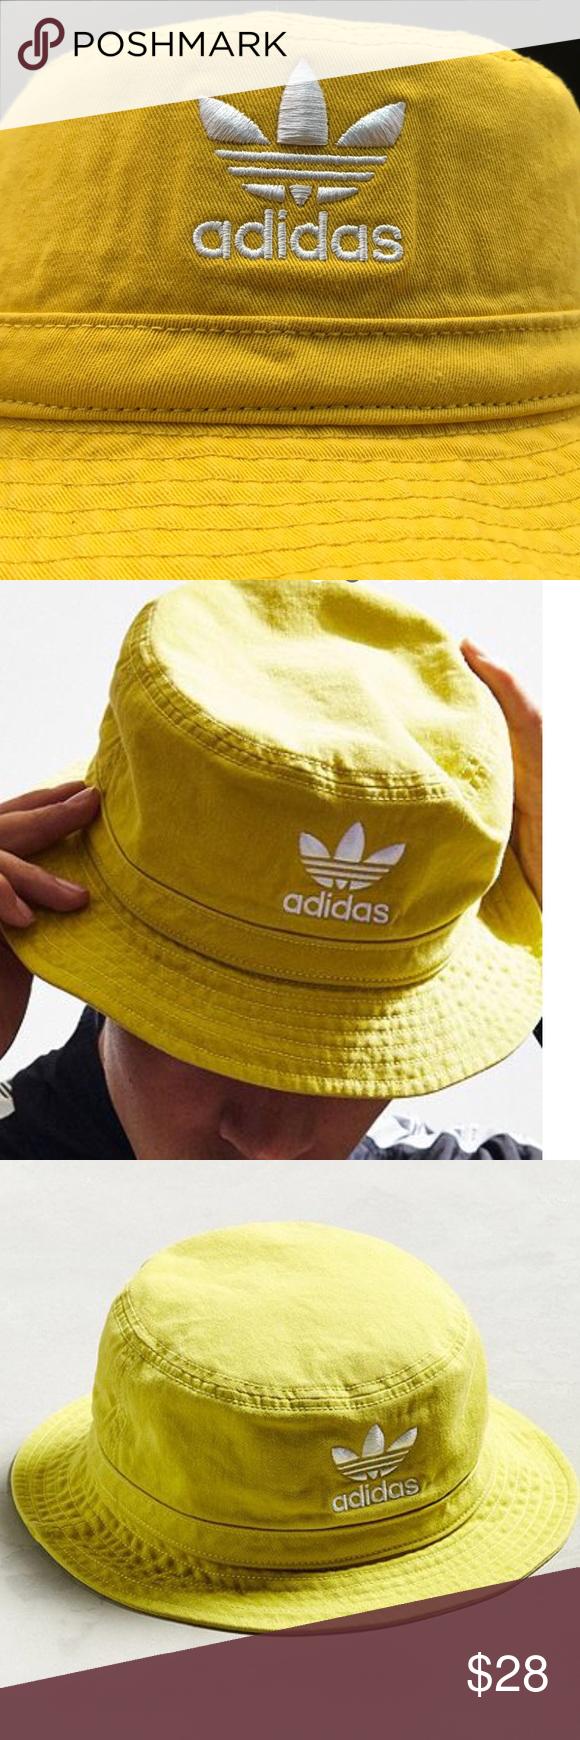 Nwt Adidas Yellow Bucket Hat Yellow Bucket Hat White Adidas Adidas